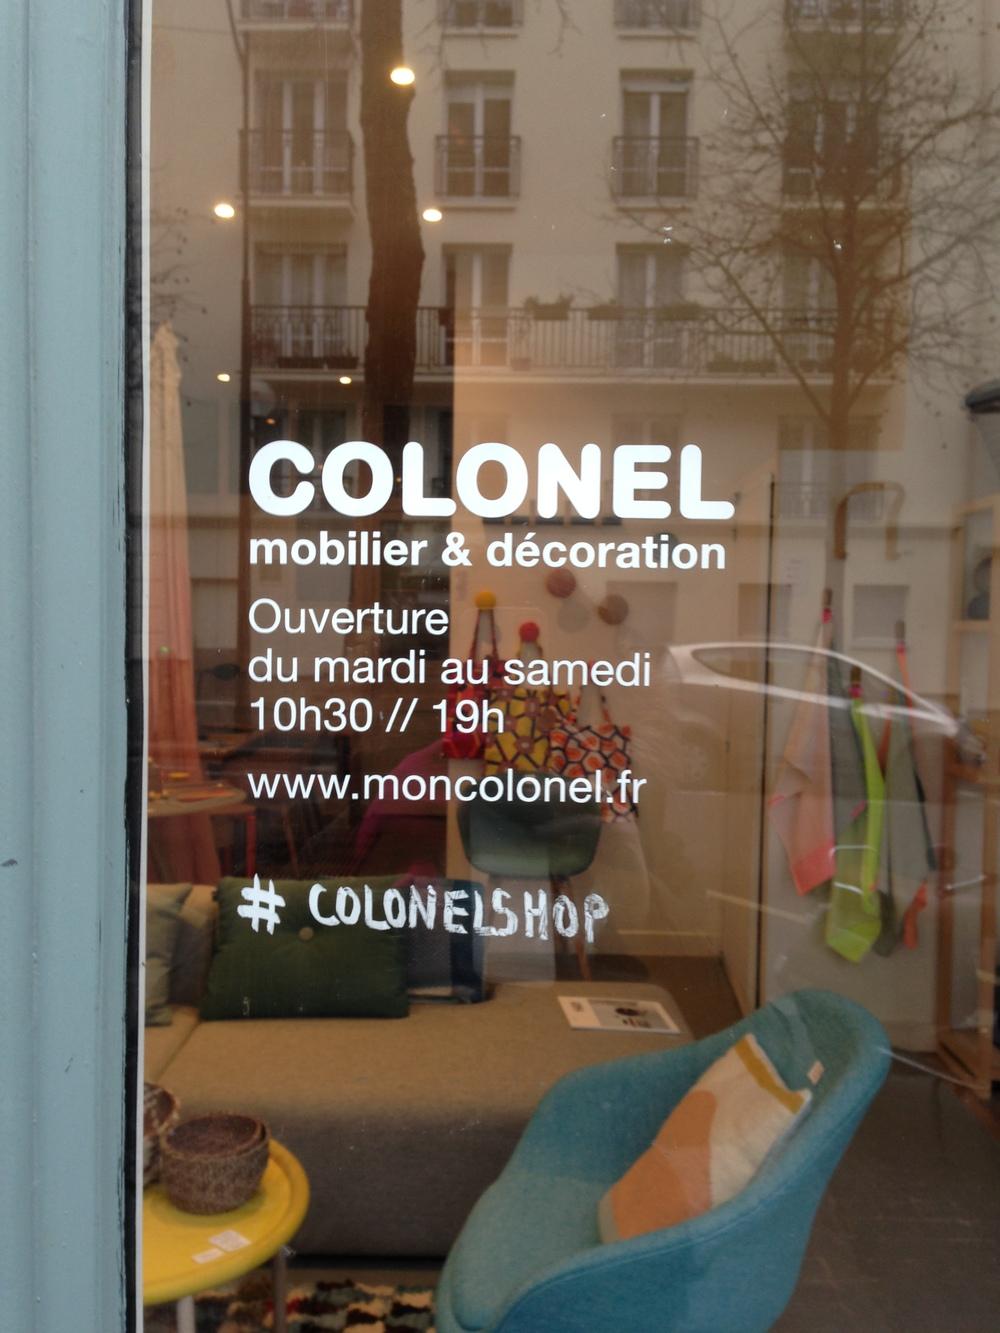 Colonel Paris Design hunting www.studioacco.be